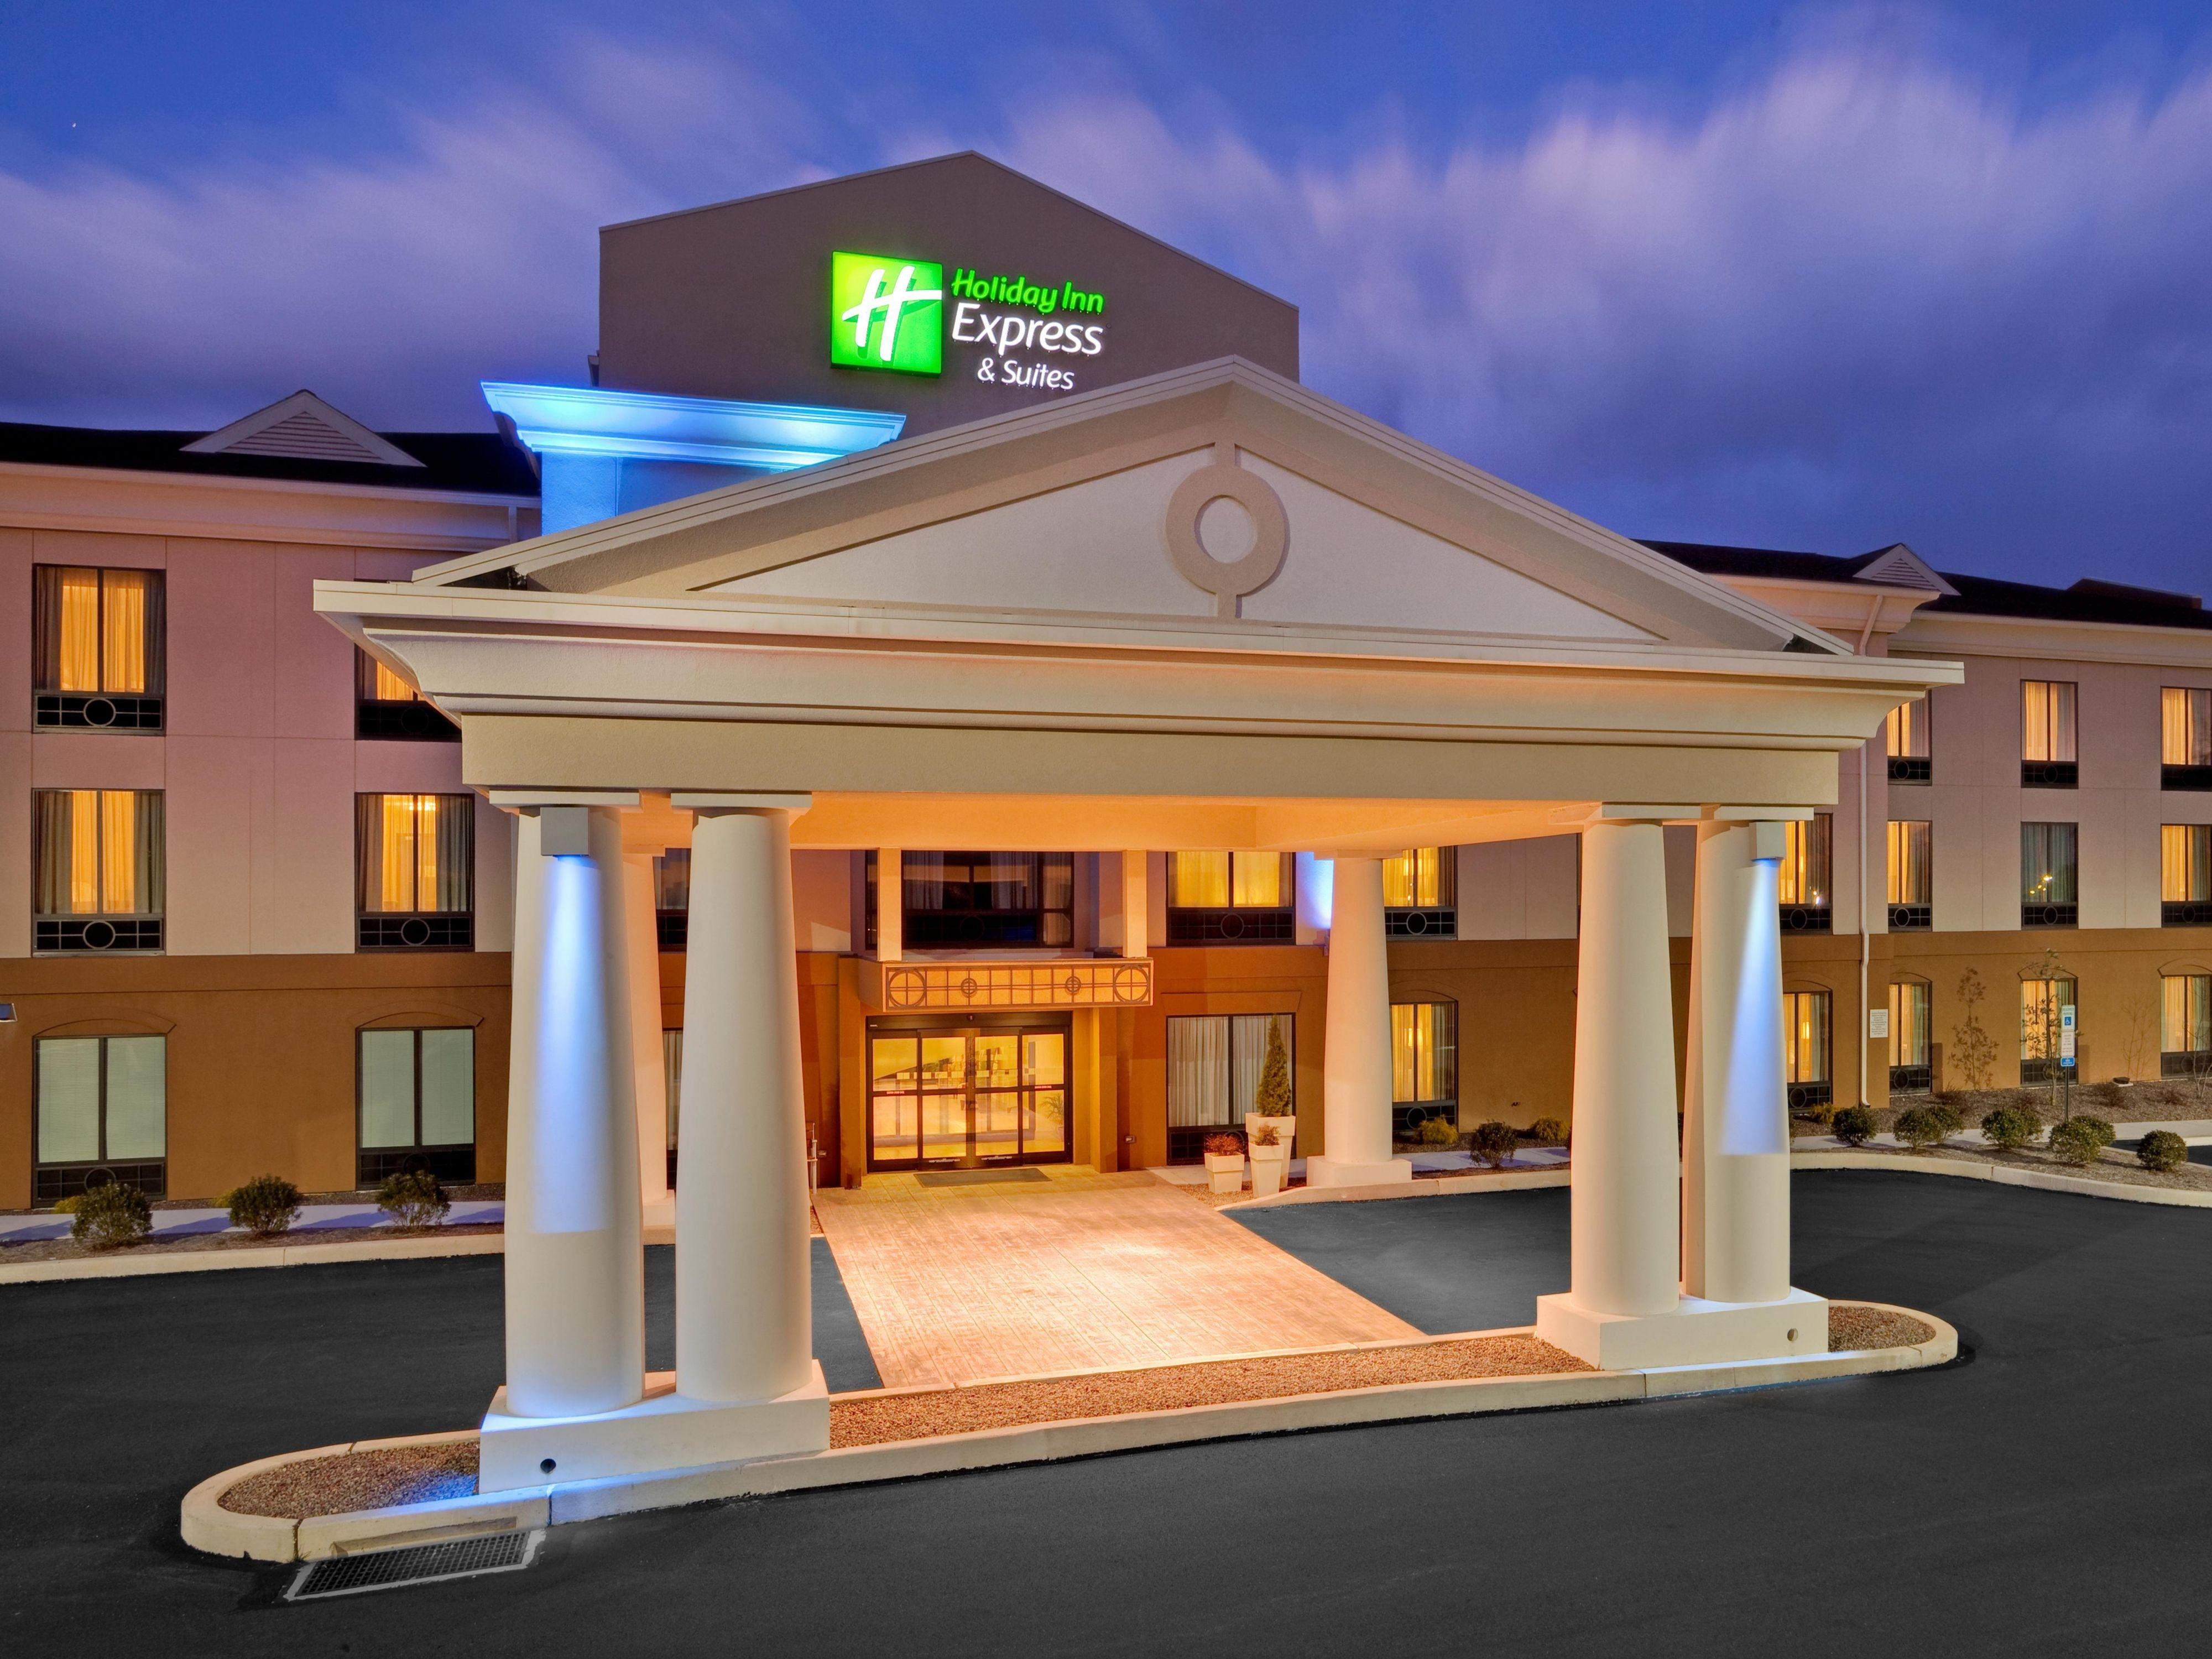 Staybridge Suites Harrisburg Extended Stay Hotel Suites By Ihg